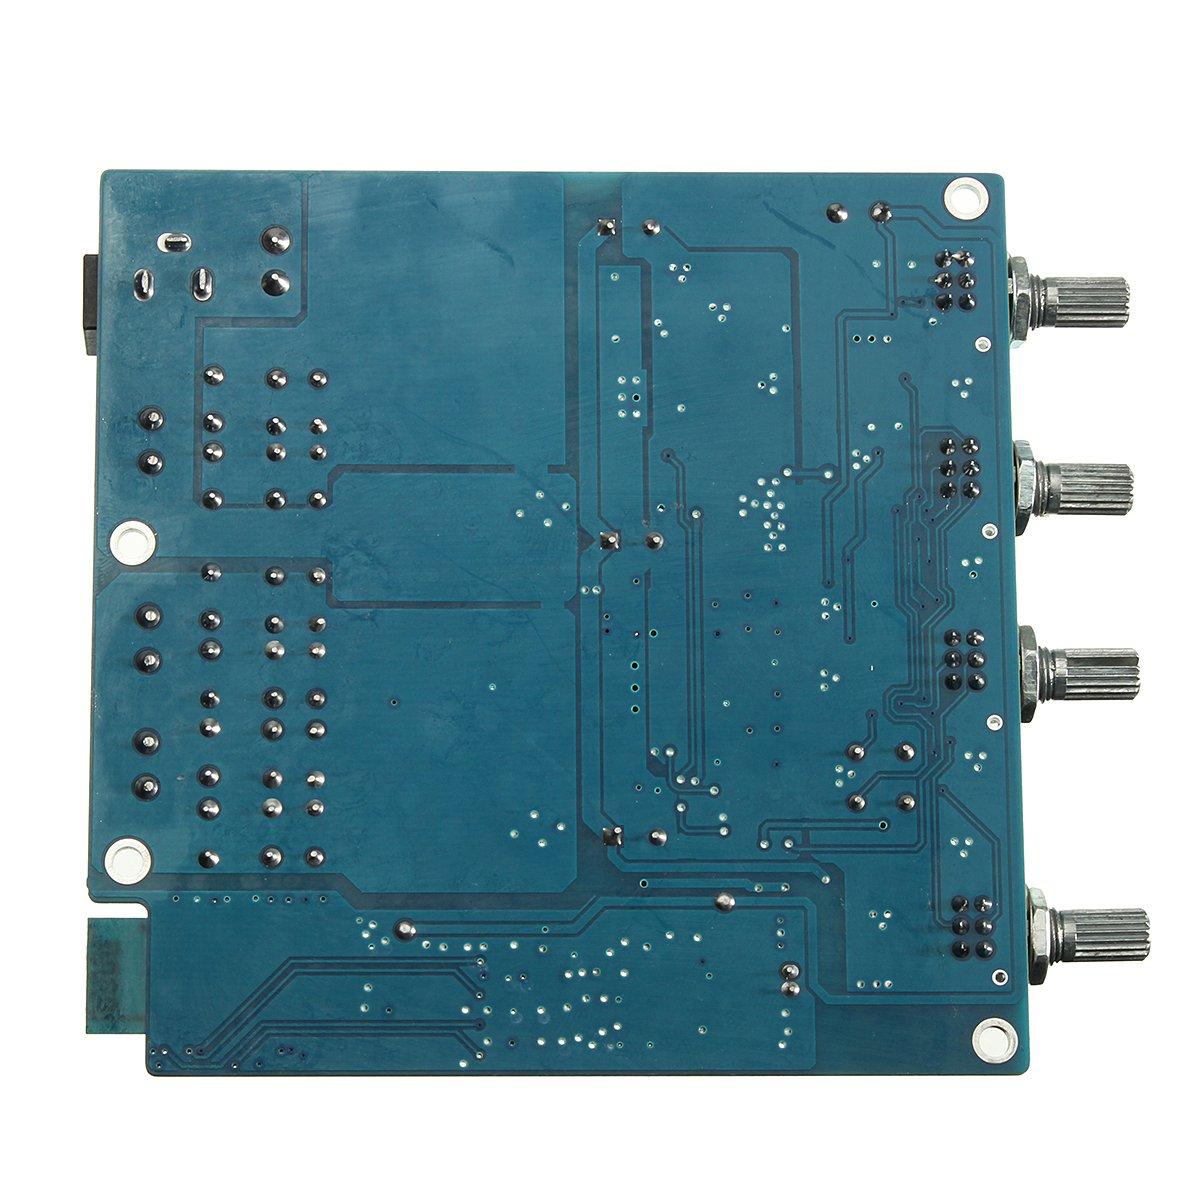 TPA3116 2.1 50Wx2+100W Bluetooth CSR4.0 Class D Power Amplifier With Acrylic Case